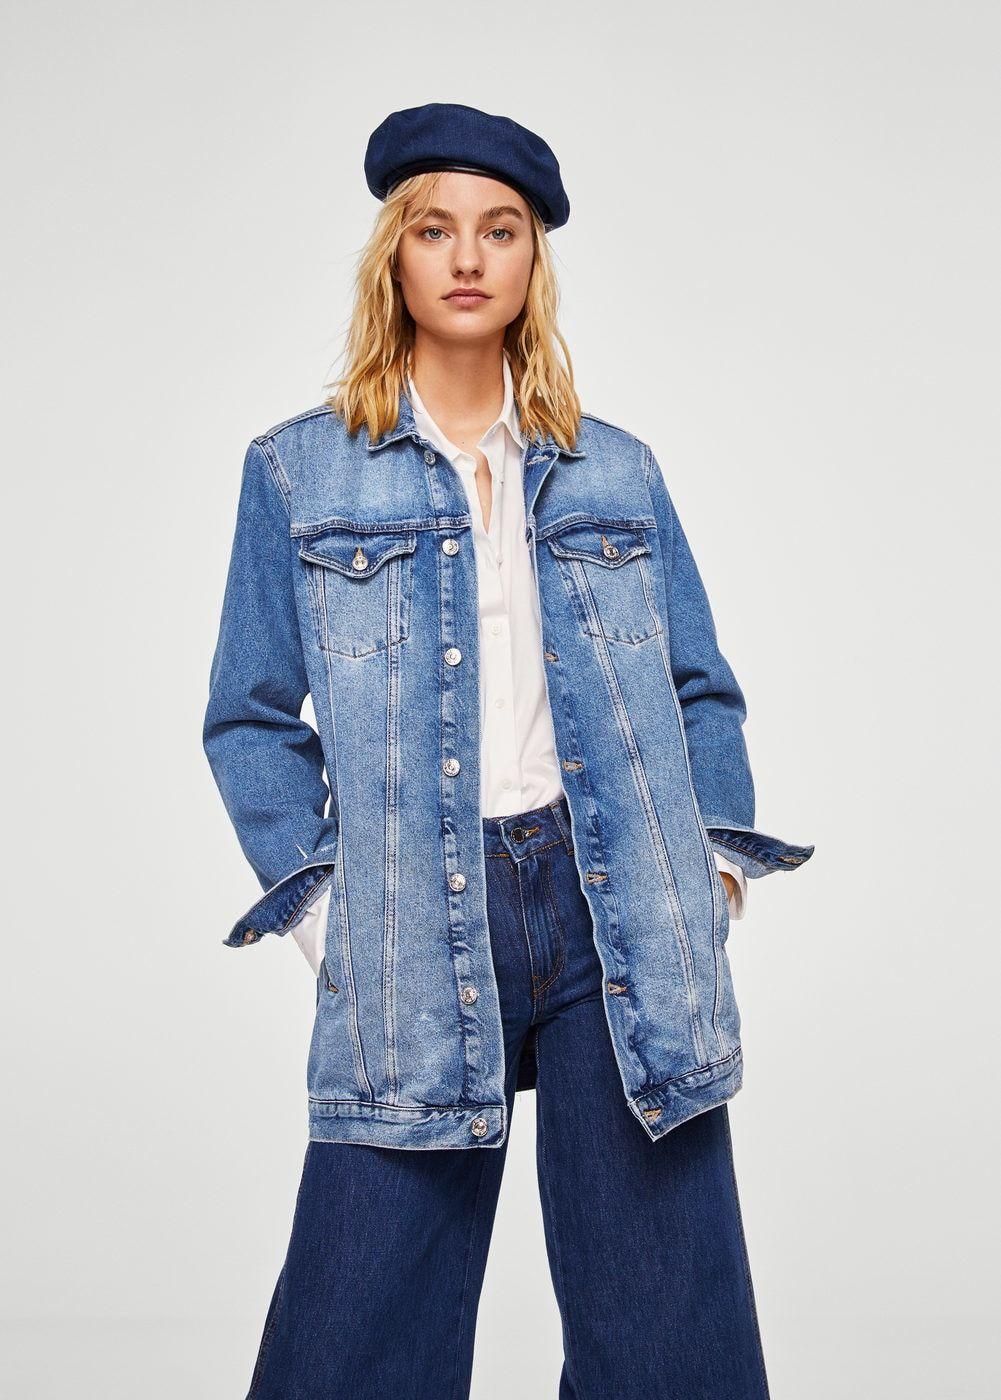 2018 Denim Pinterest Women Oversize In Jacket Jackets IBdnp1px